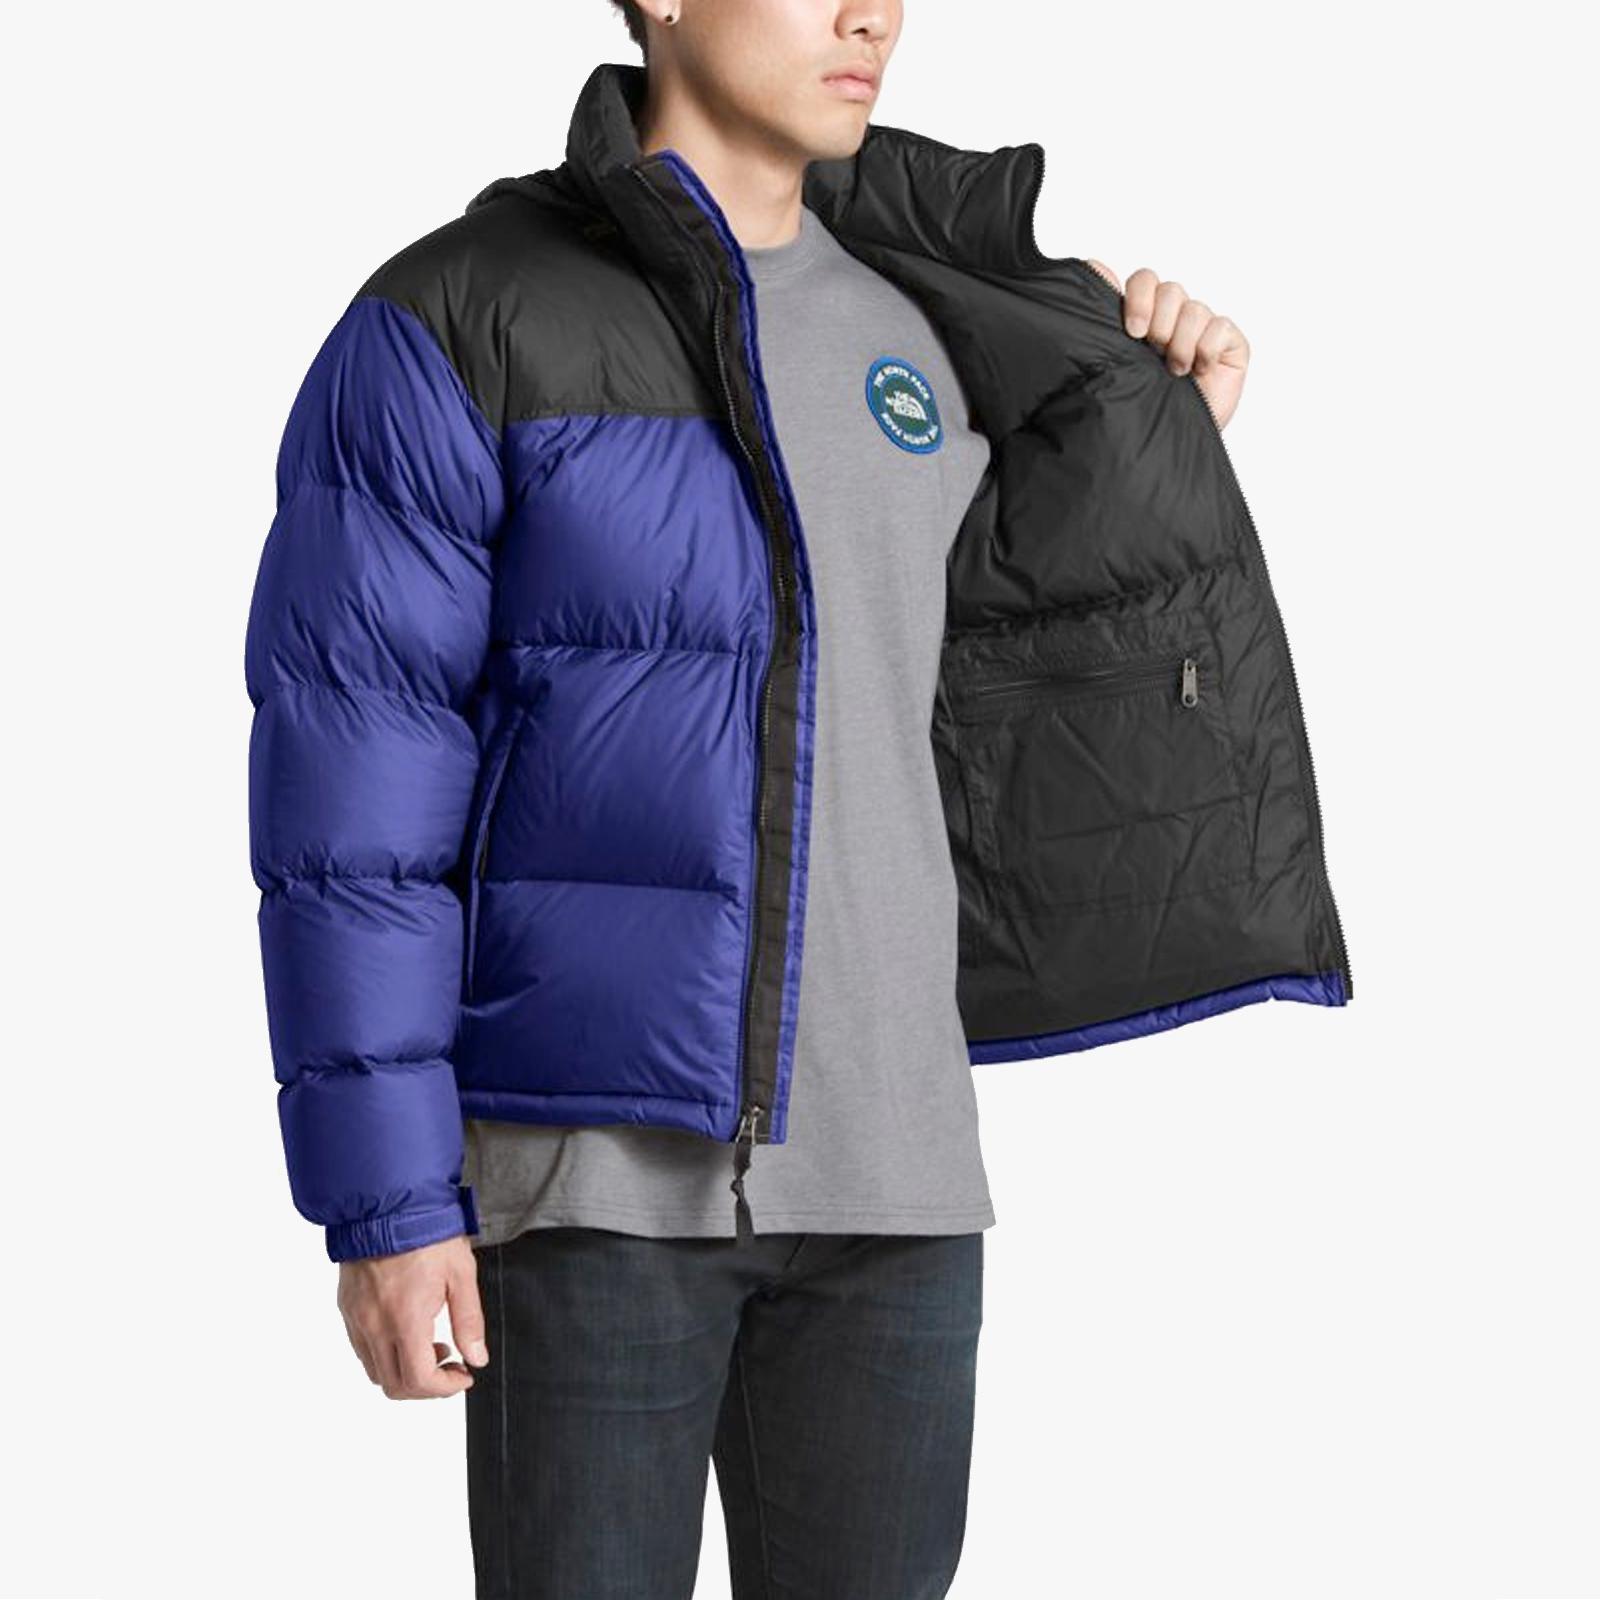 The North Face 1996 Retro Nuptse Jacket Nf0a3c8d5nx